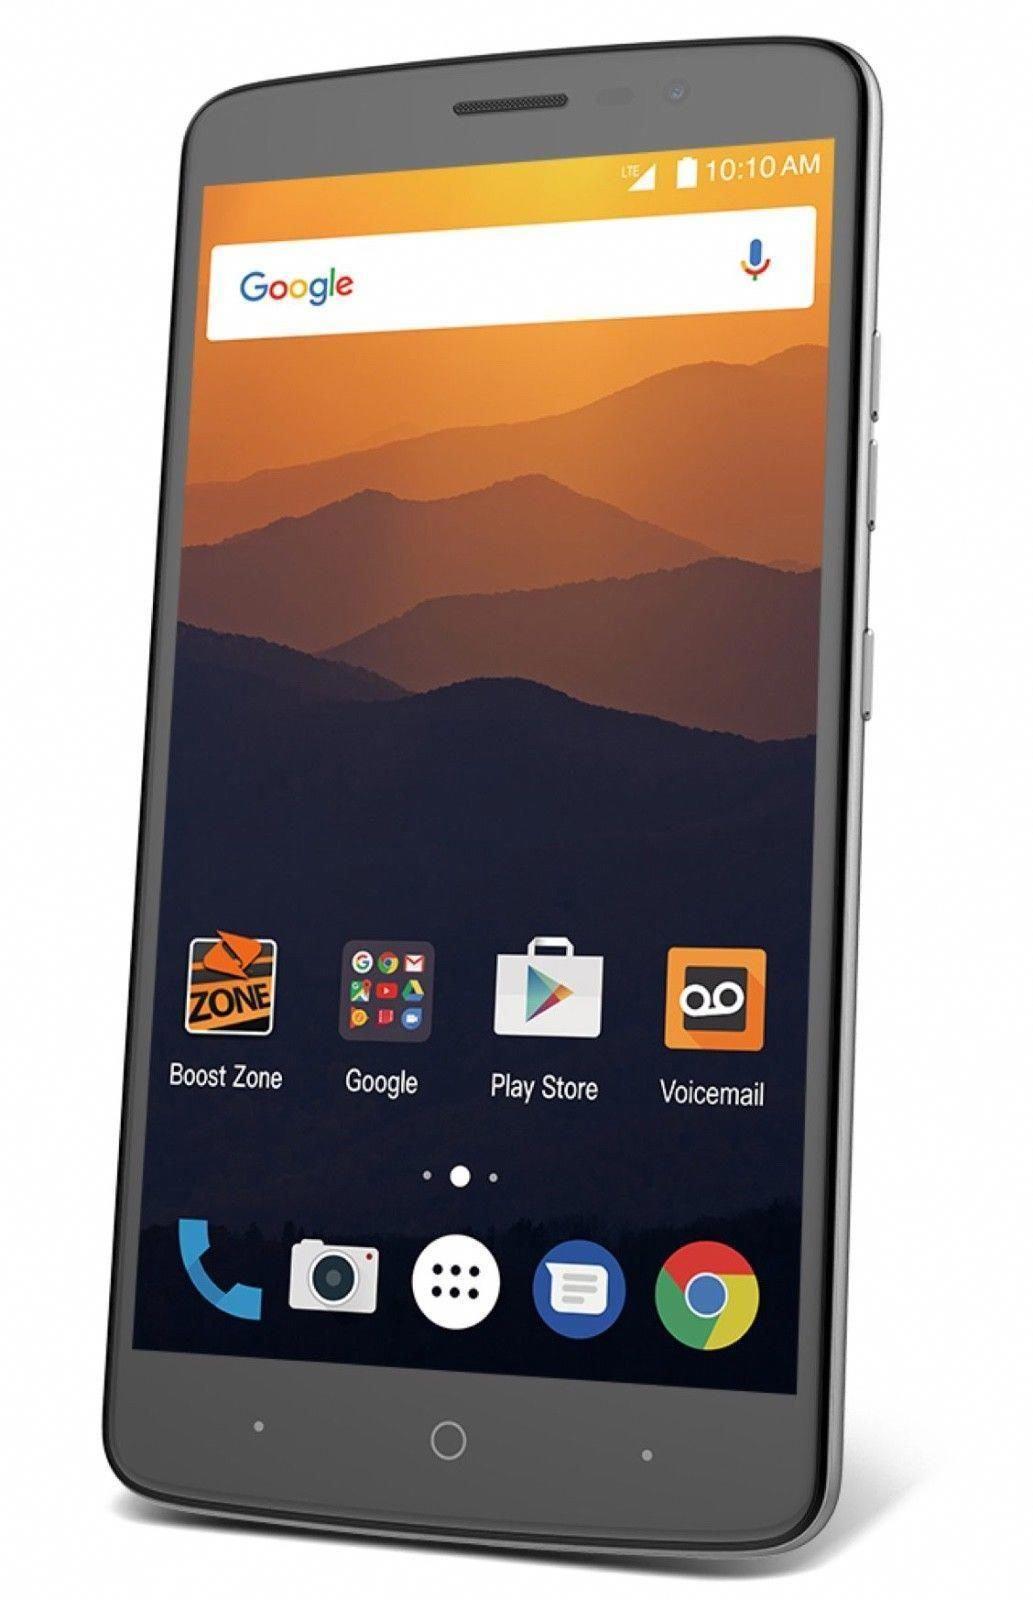 Best Boost Mobile Phone 2019 29 Best Boost Mobile Phones Samsung Galaxy Boost Mobile Phones Zte